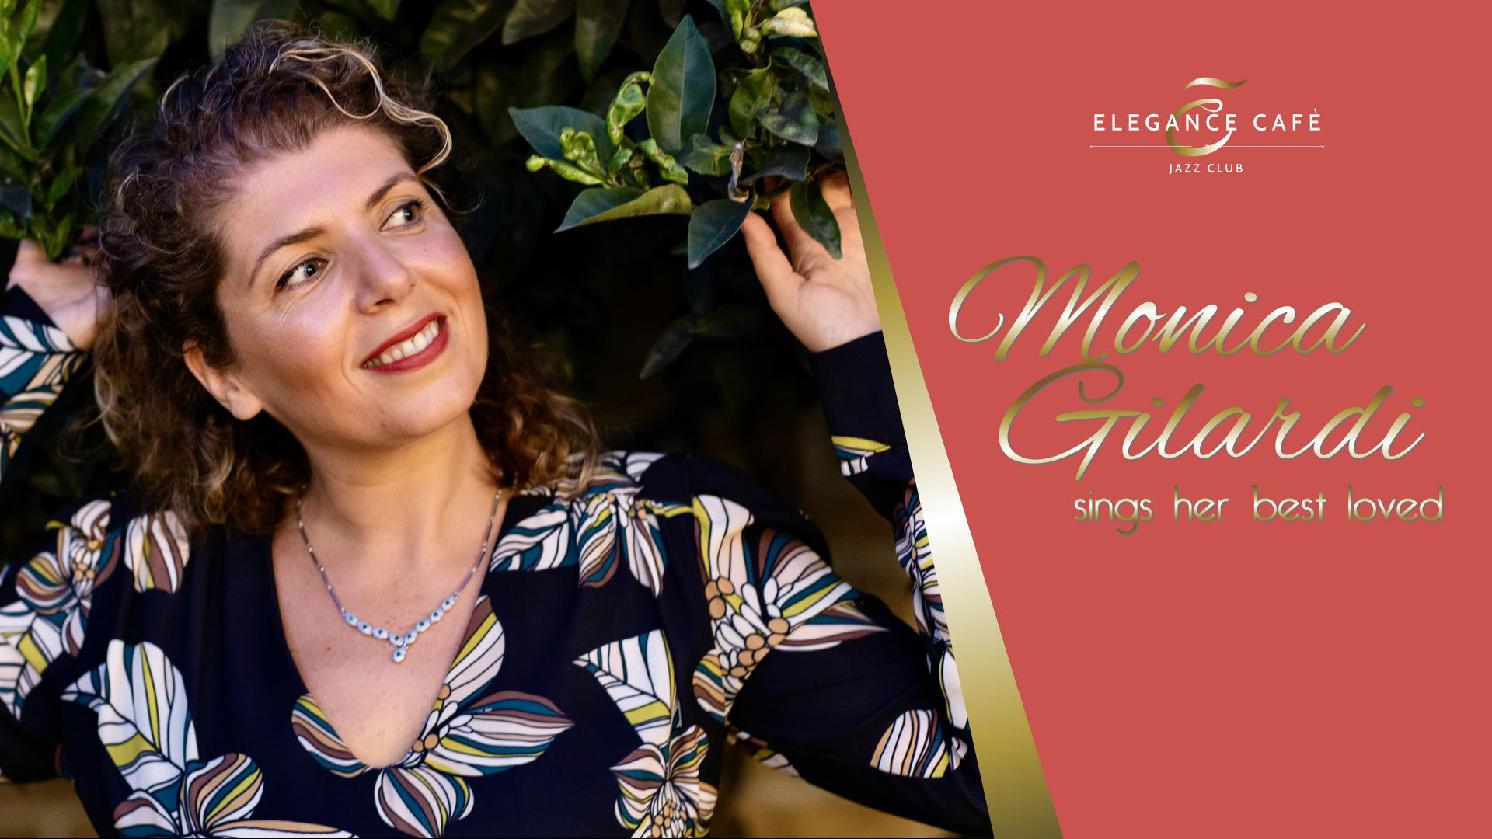 Monica Gilardi Sings Her Best Loved